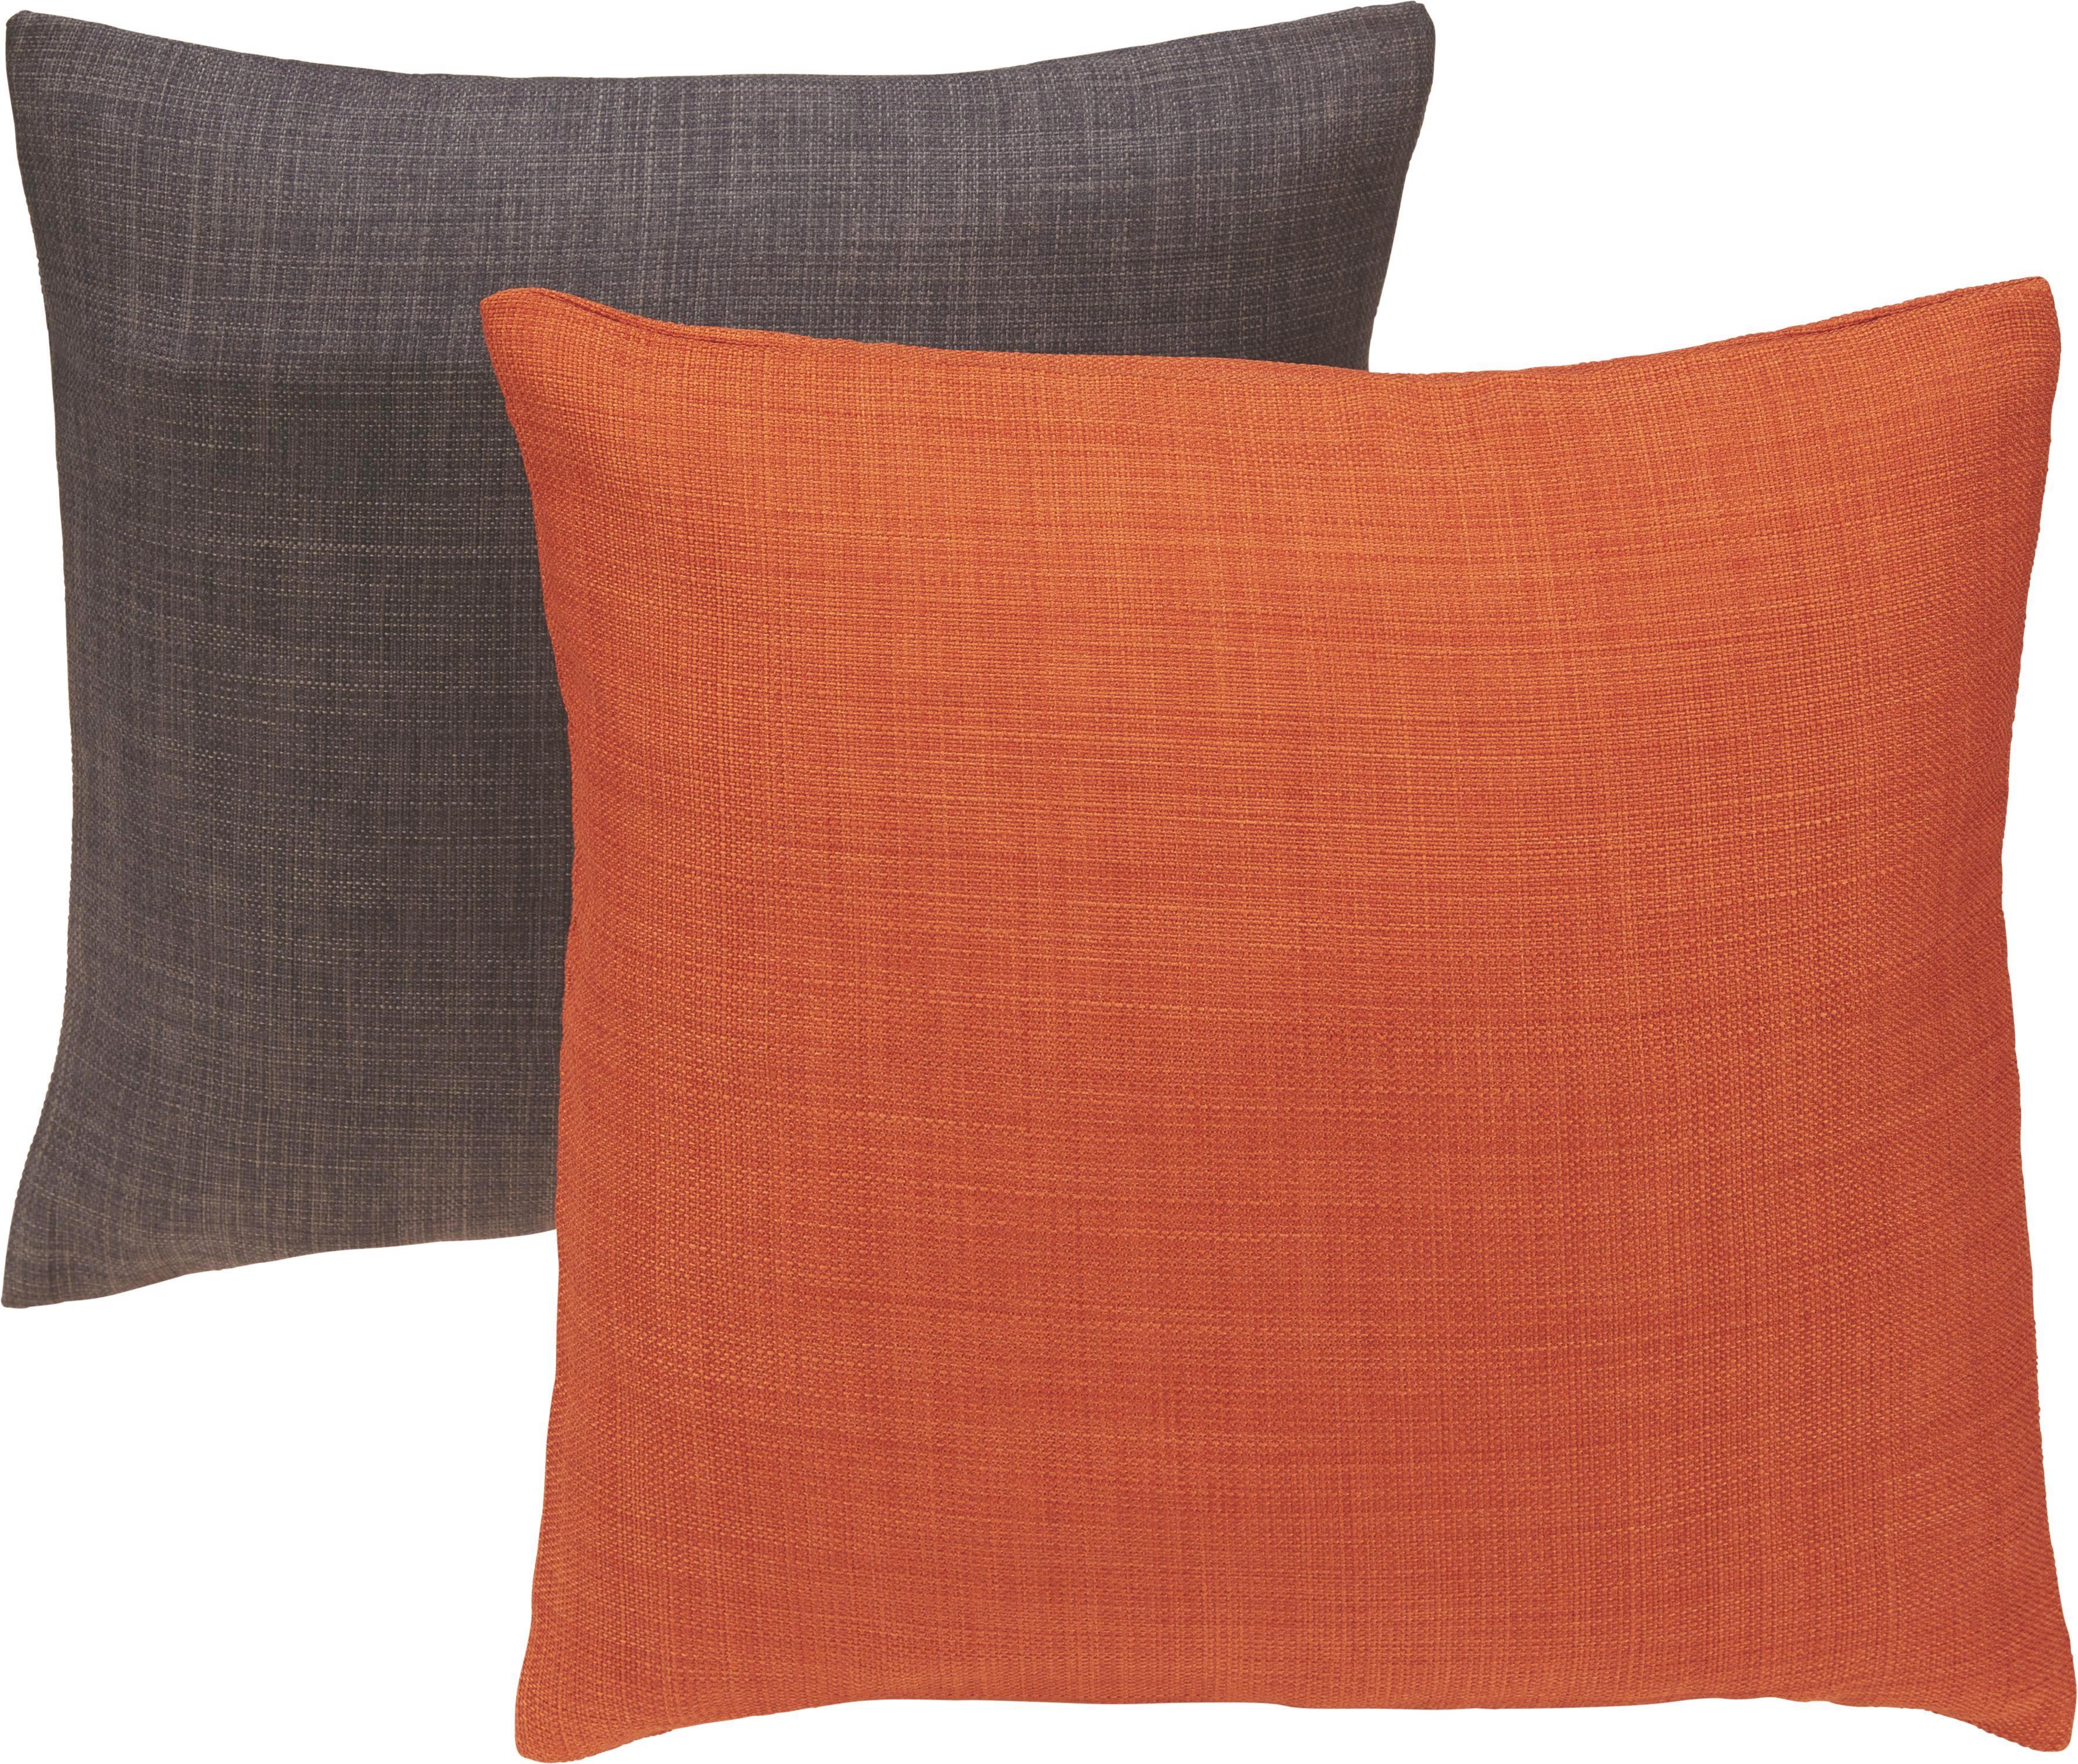 Kissenhülle Leinenoptik, ca. 40x40cm - Dunkelbraun, KONVENTIONELL, Textil (40/40cm) - MÖMAX modern living